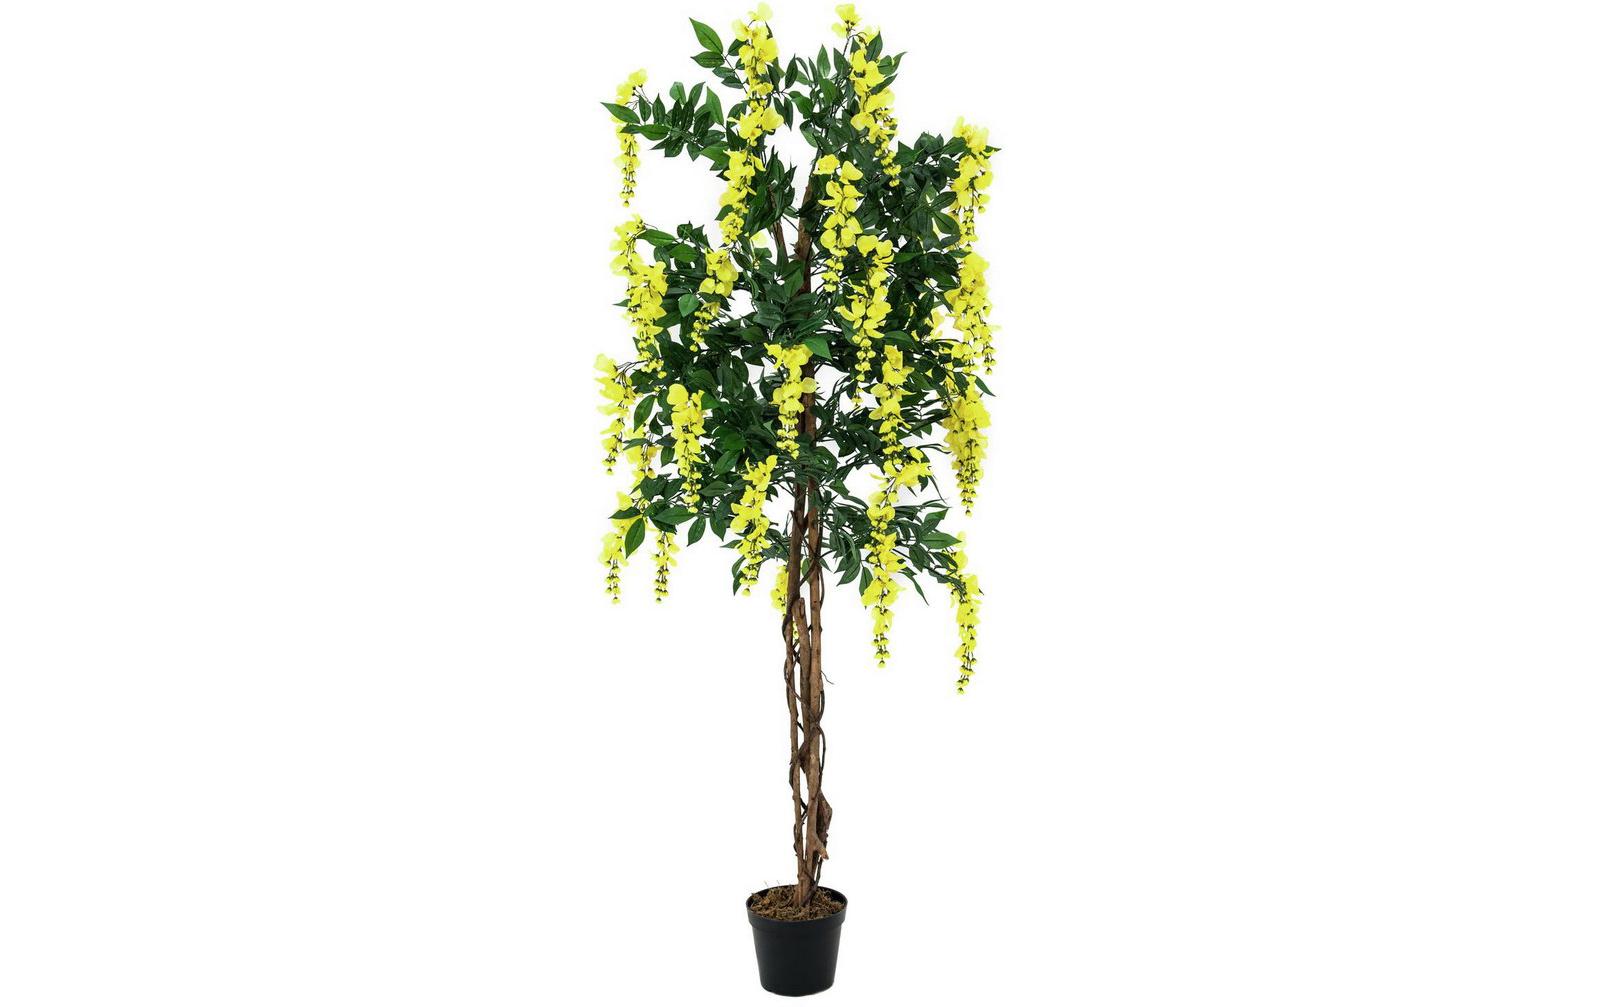 europalms-goldregenbaum-gelb-150cm-kunststoffpflanze